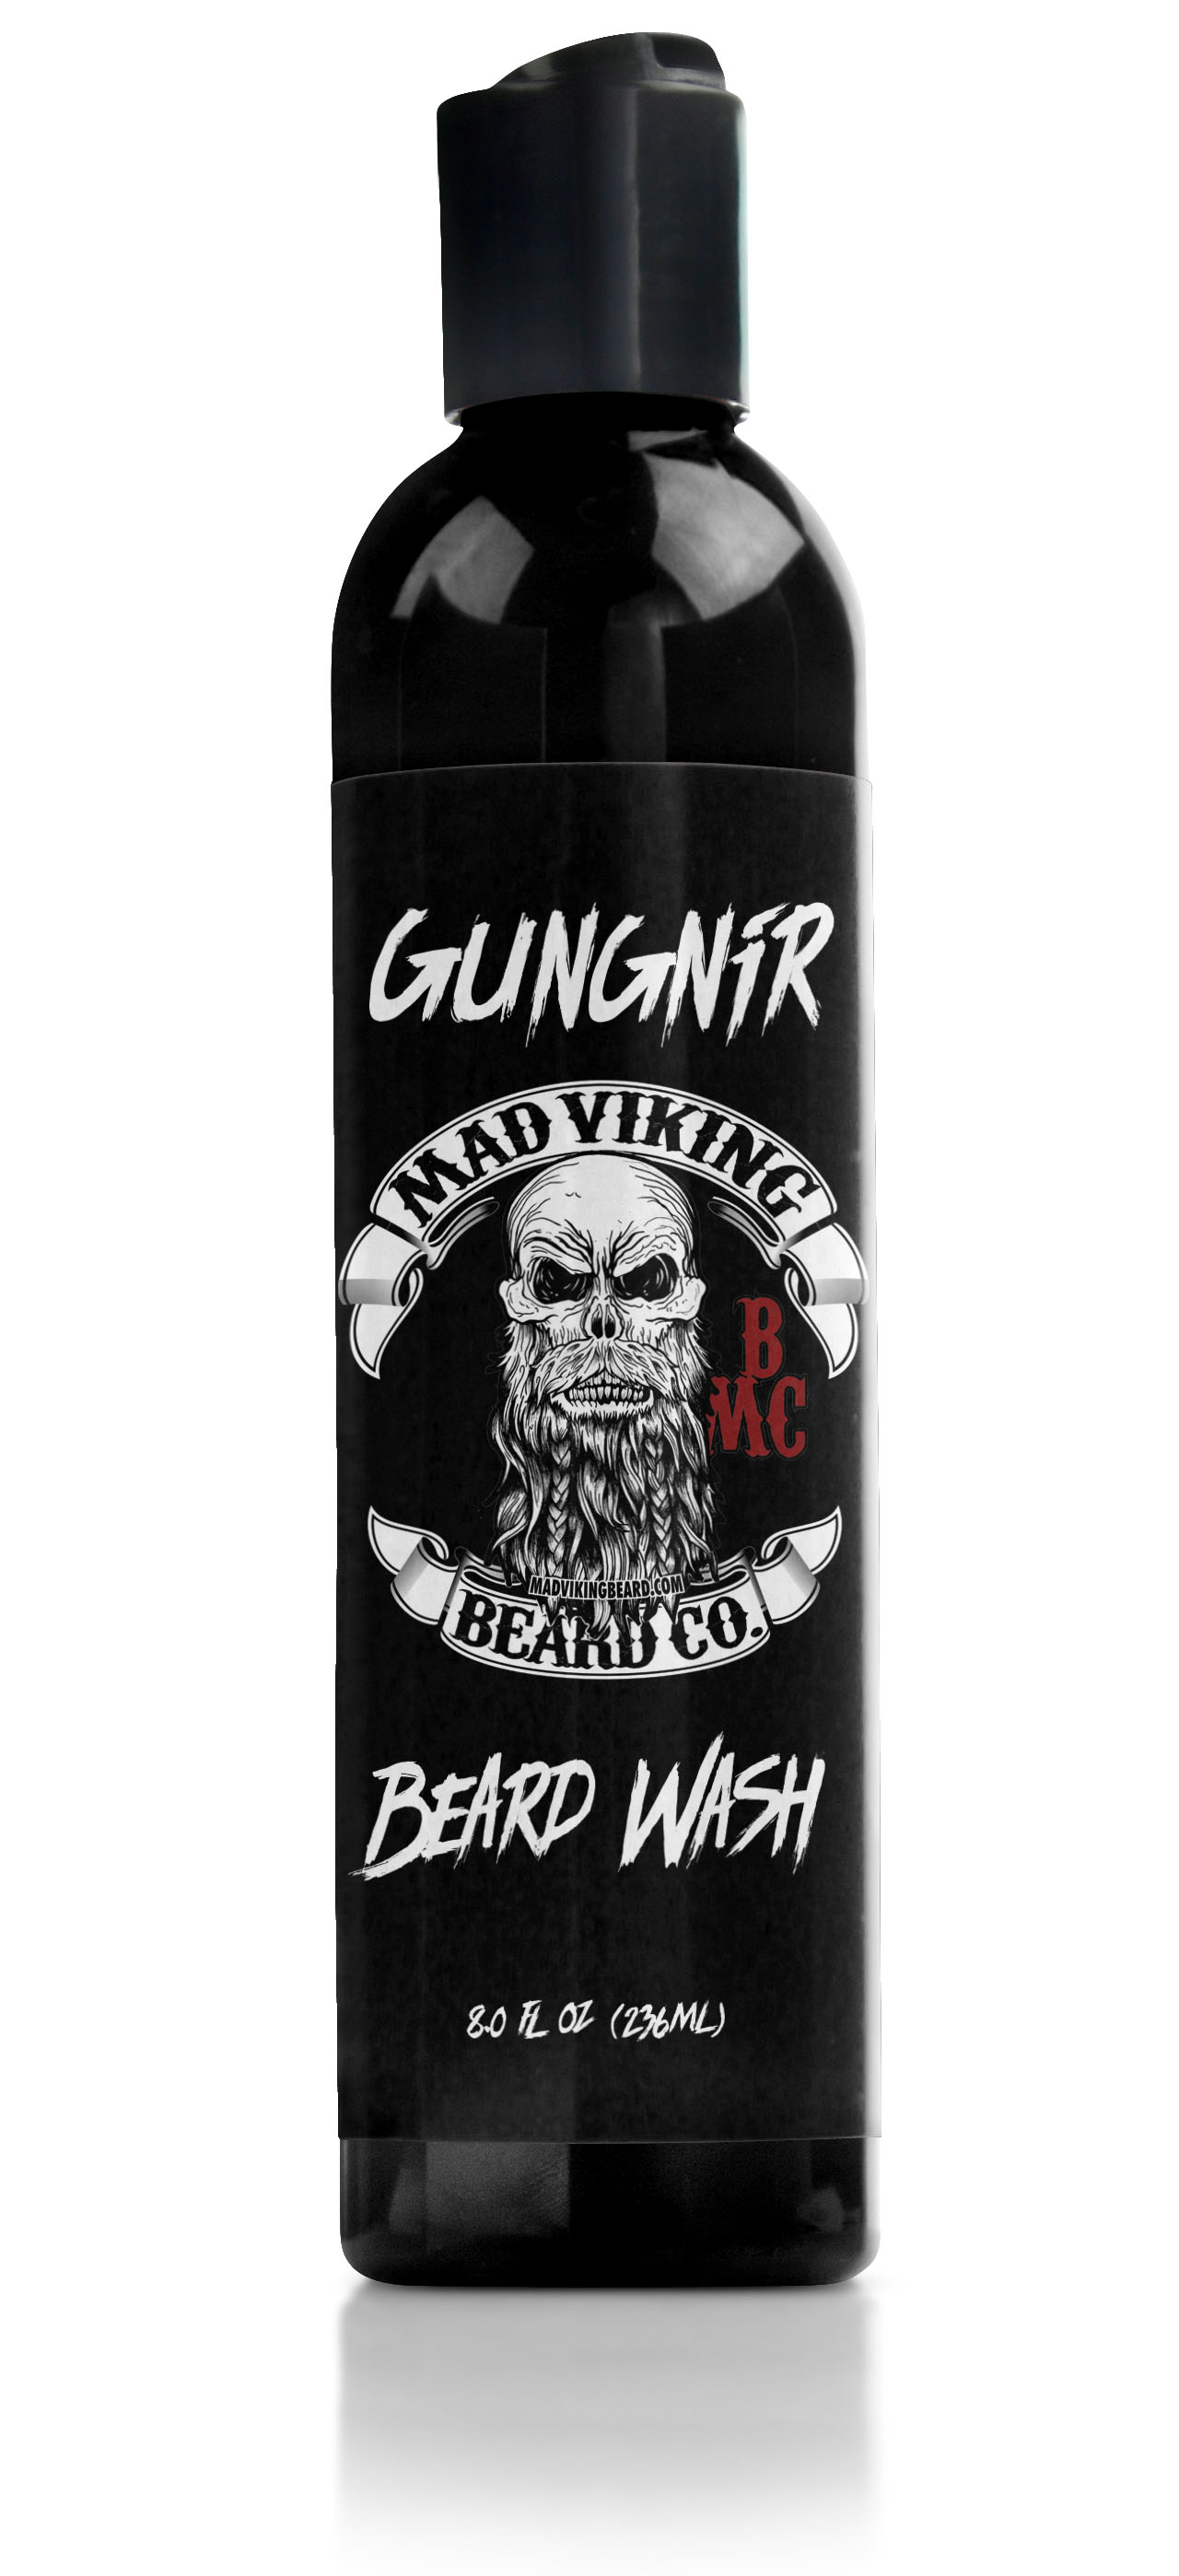 Gungnir Mad Viking's Beard Wash